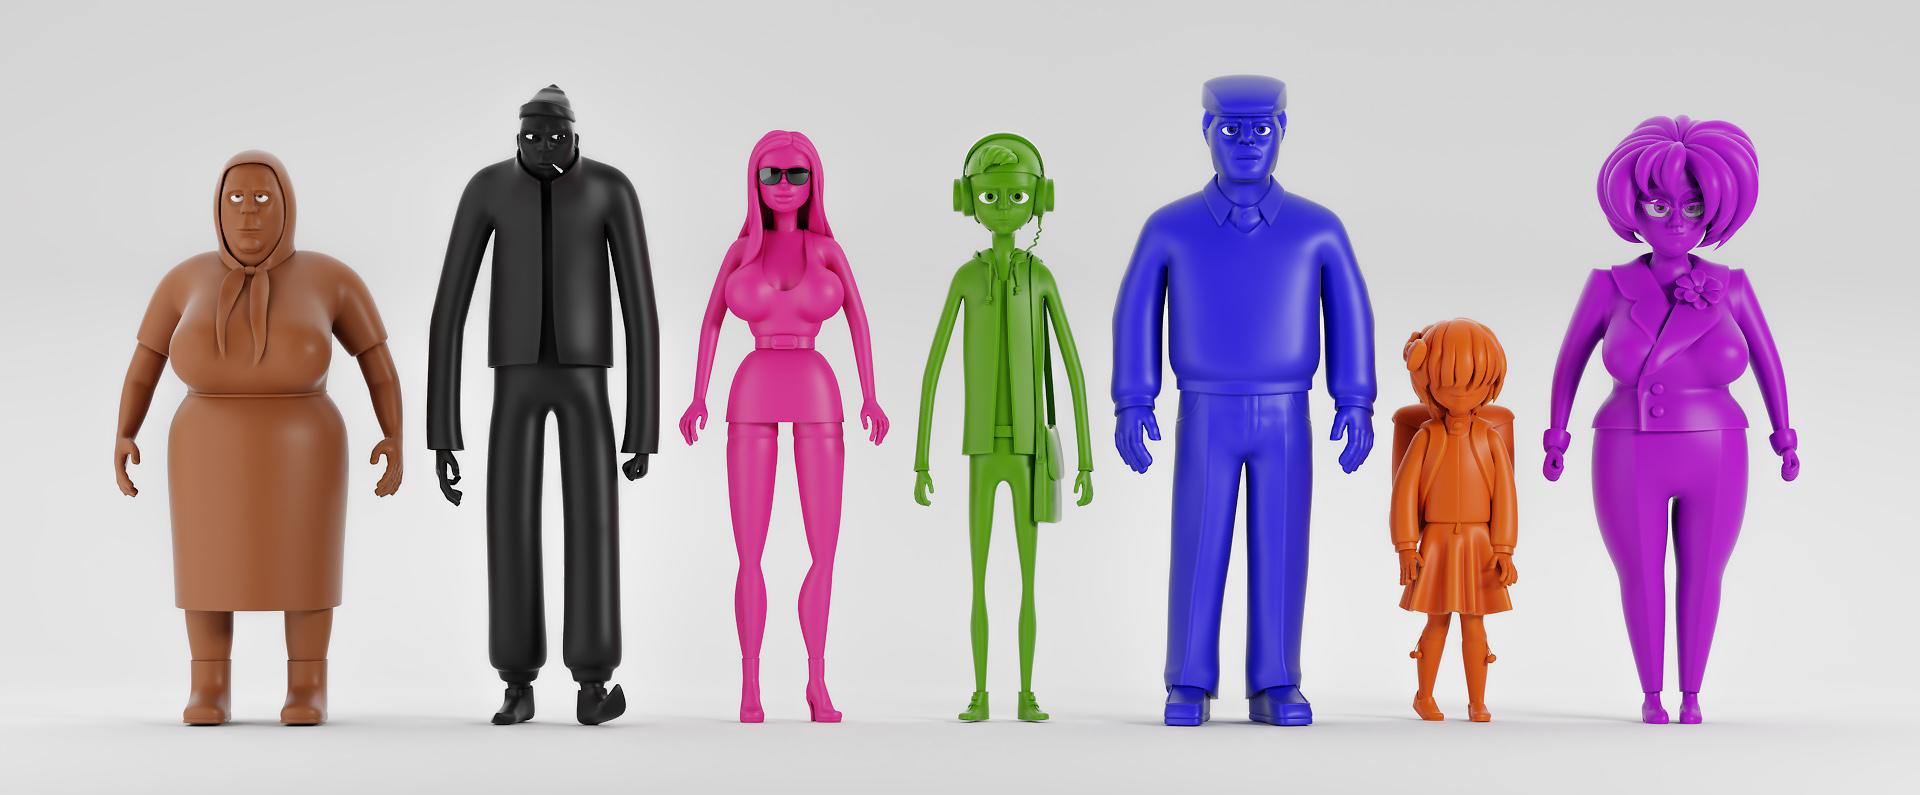 CSDD_Characters.jpg